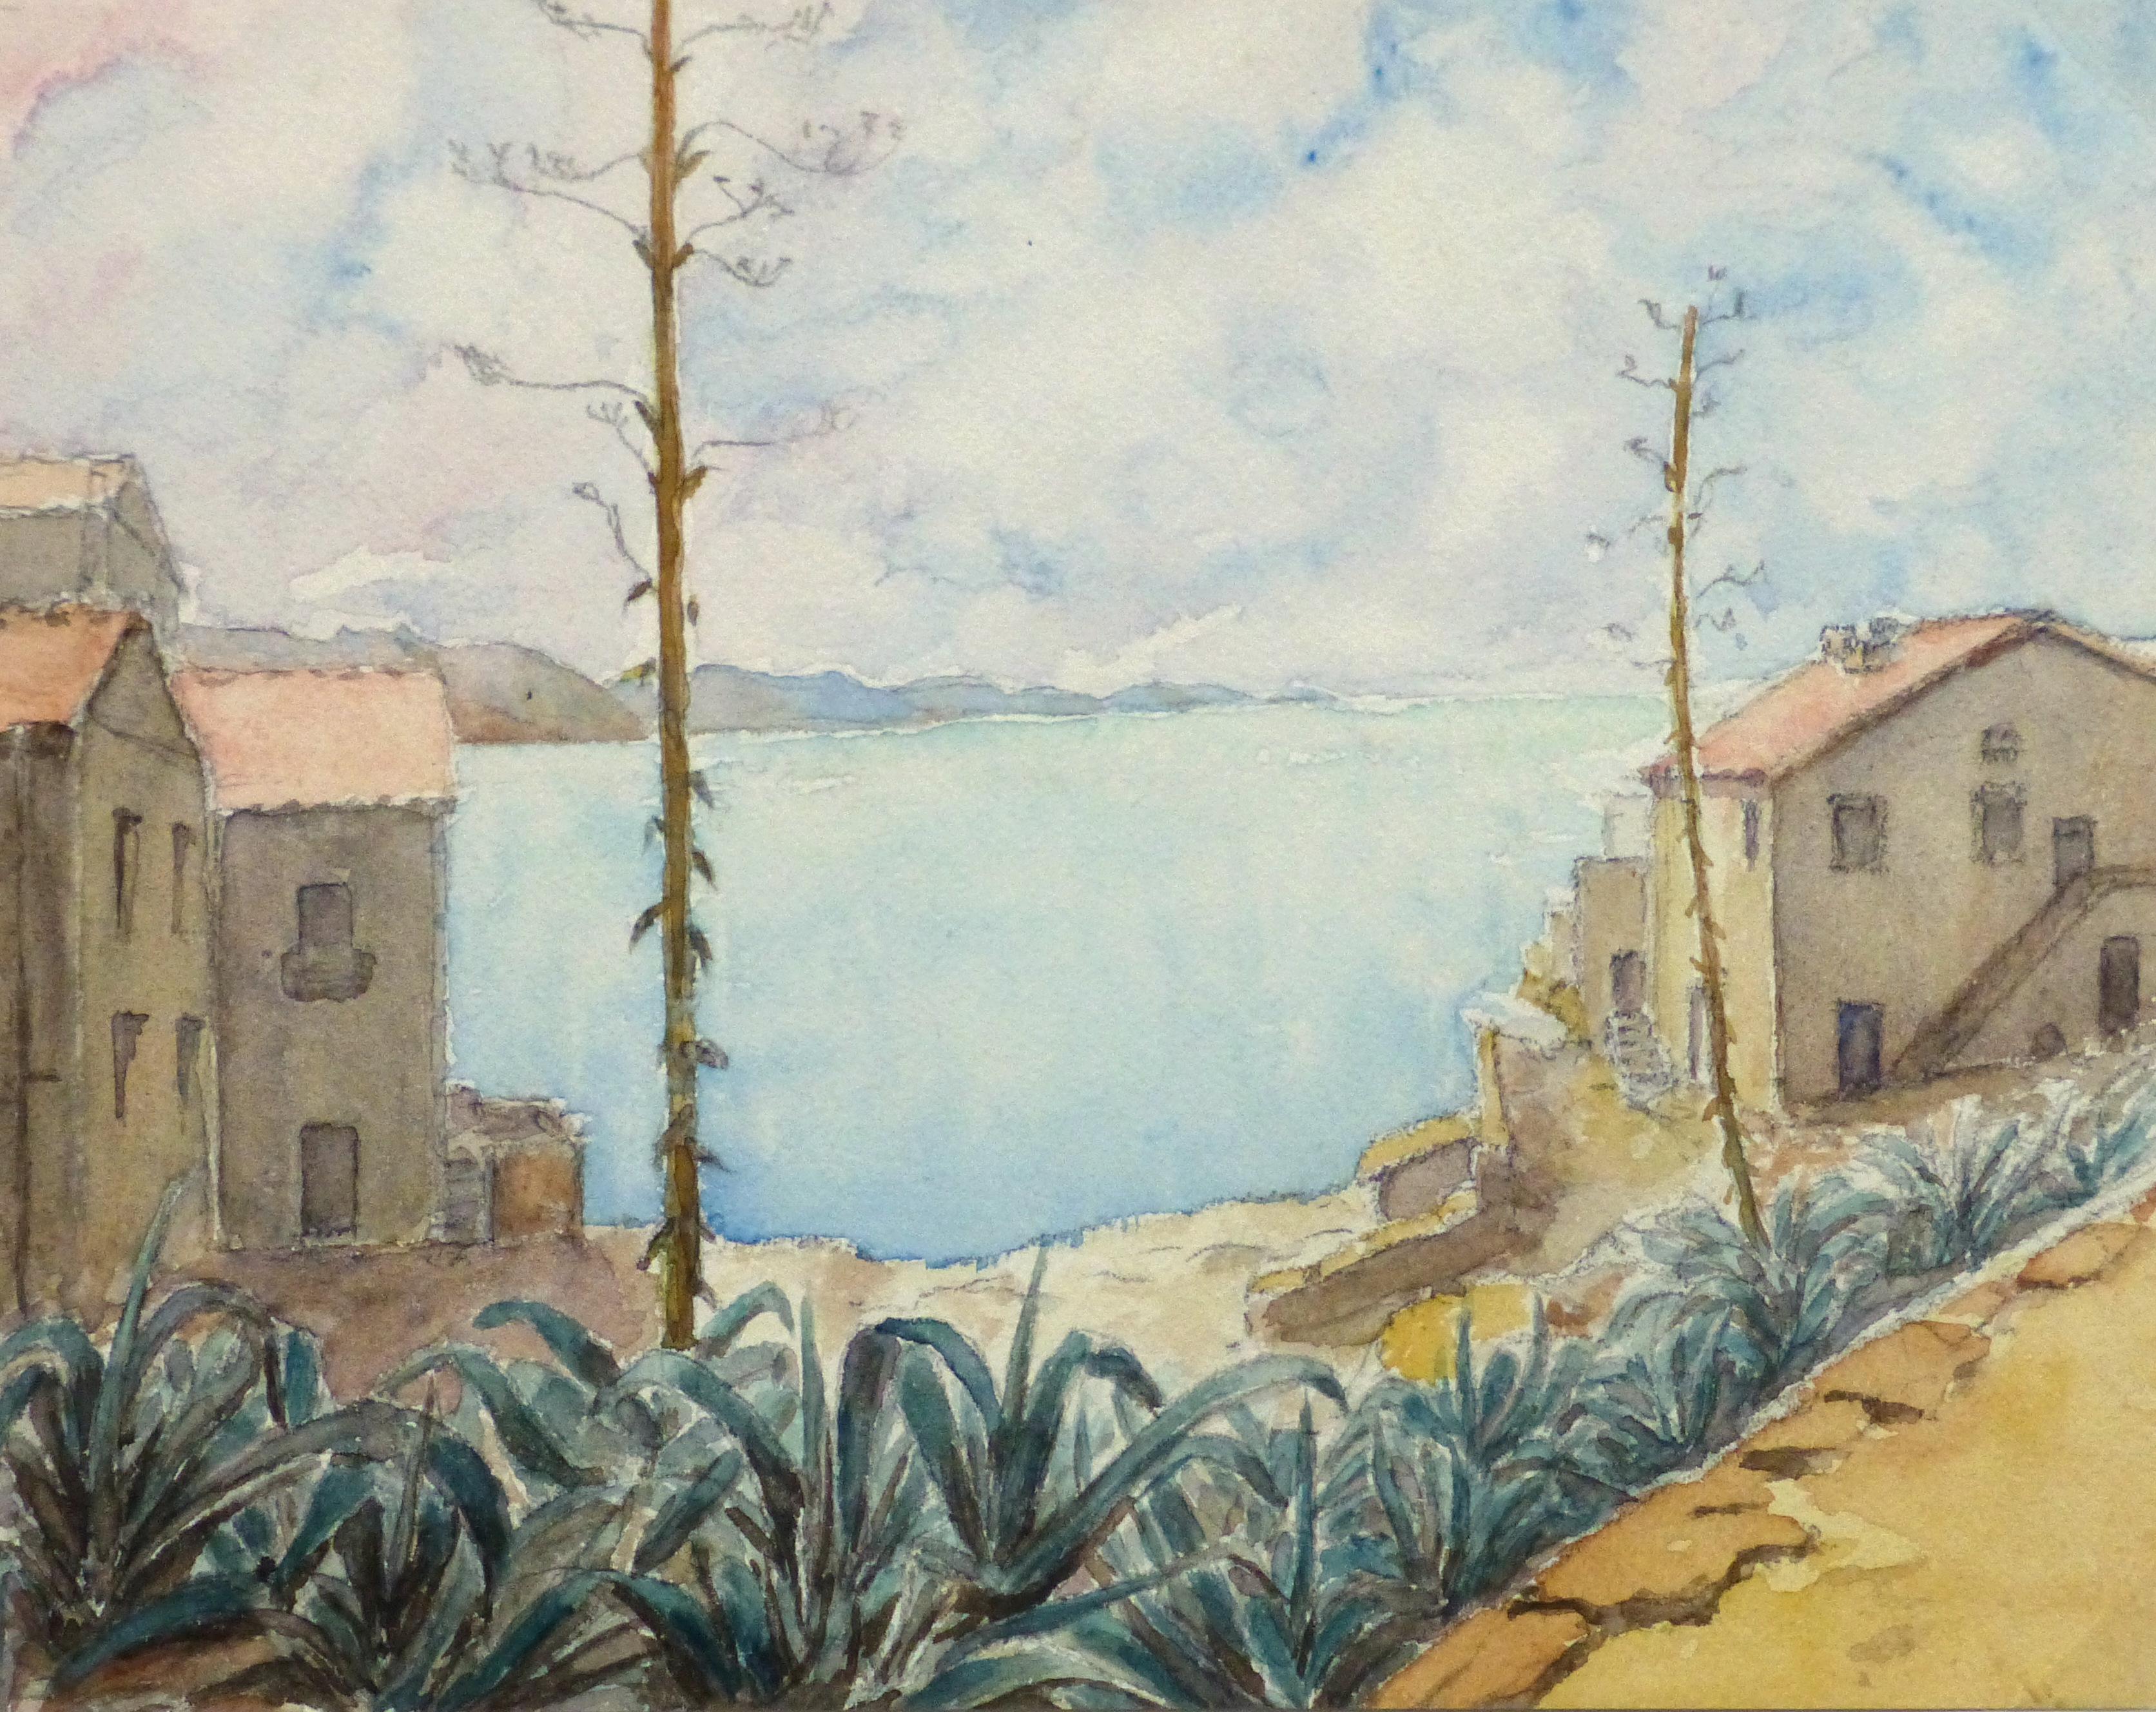 atercolor Landscape - Bayside Villas, Circa 1930-main-10740M